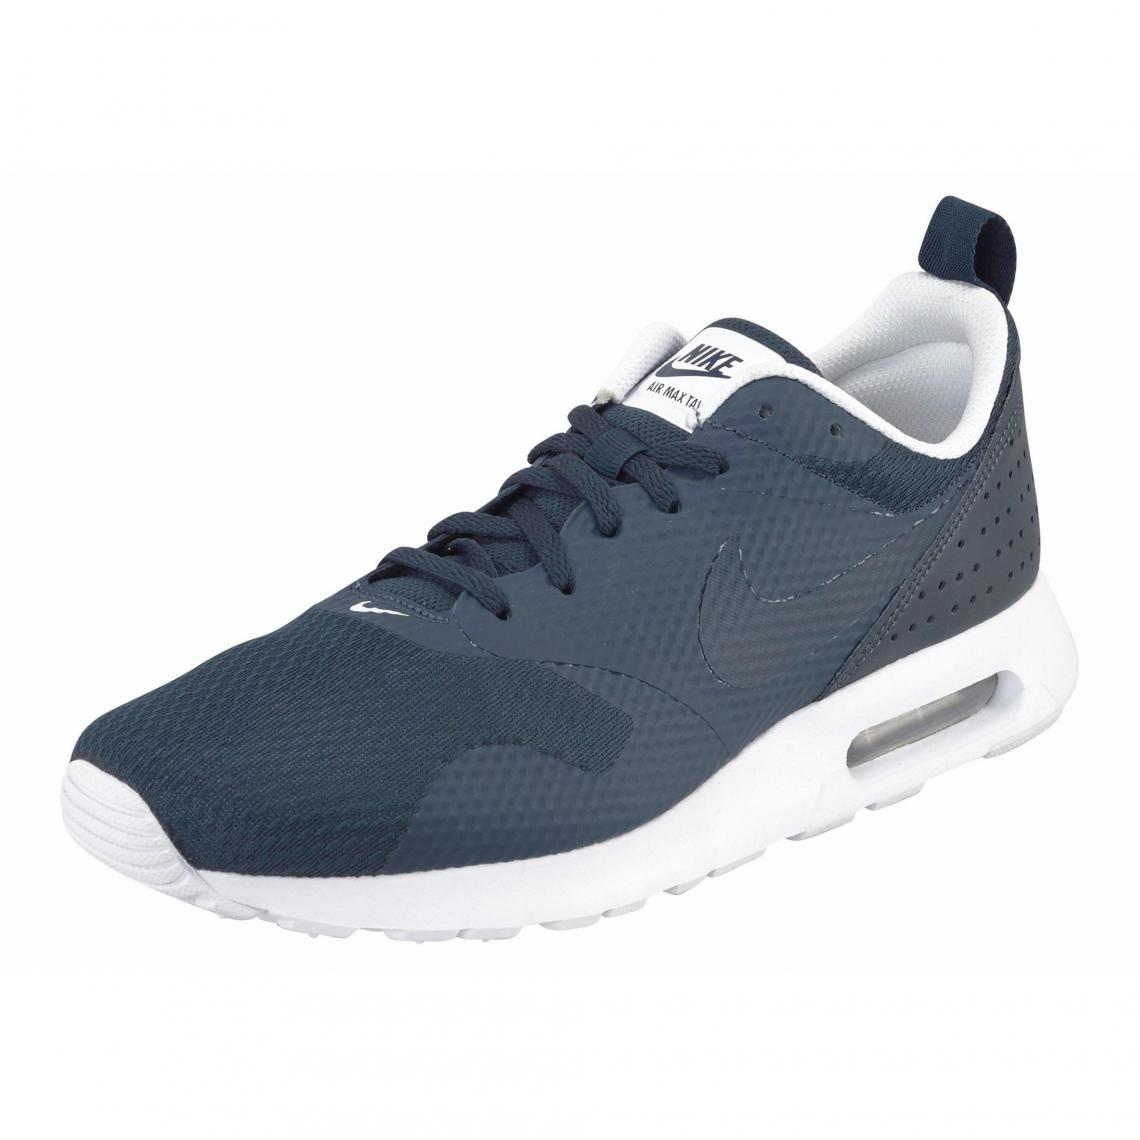 Running Marine De Homme Max Nike 3suisses Chaussures Air Tavas Ovg0qFX